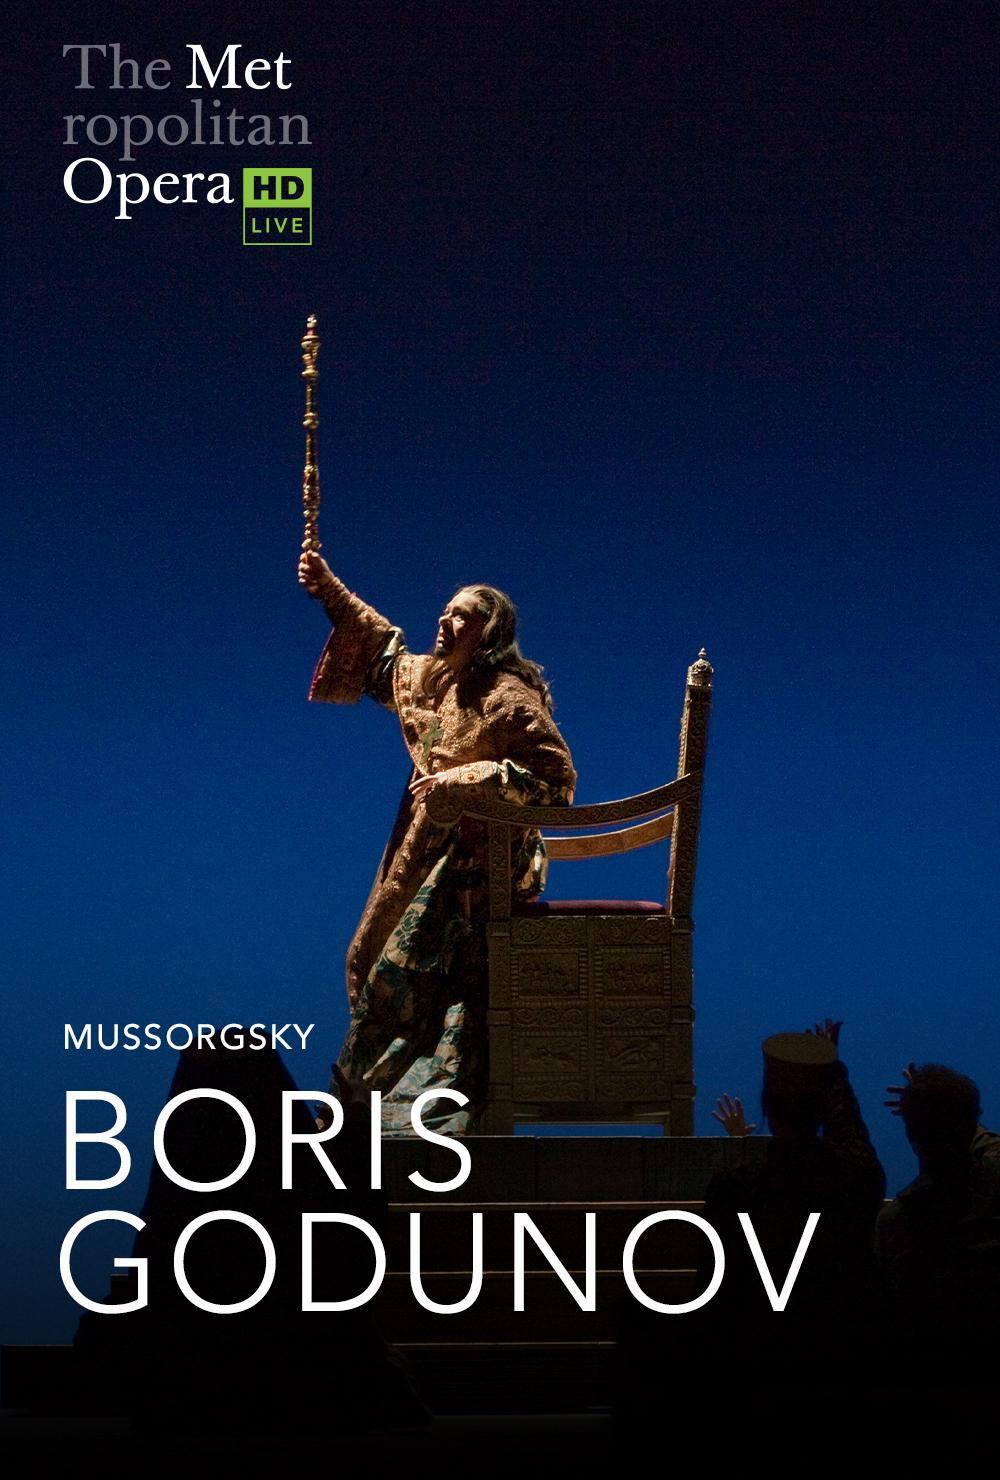 The Metropolitan Opera: Borys Godunow